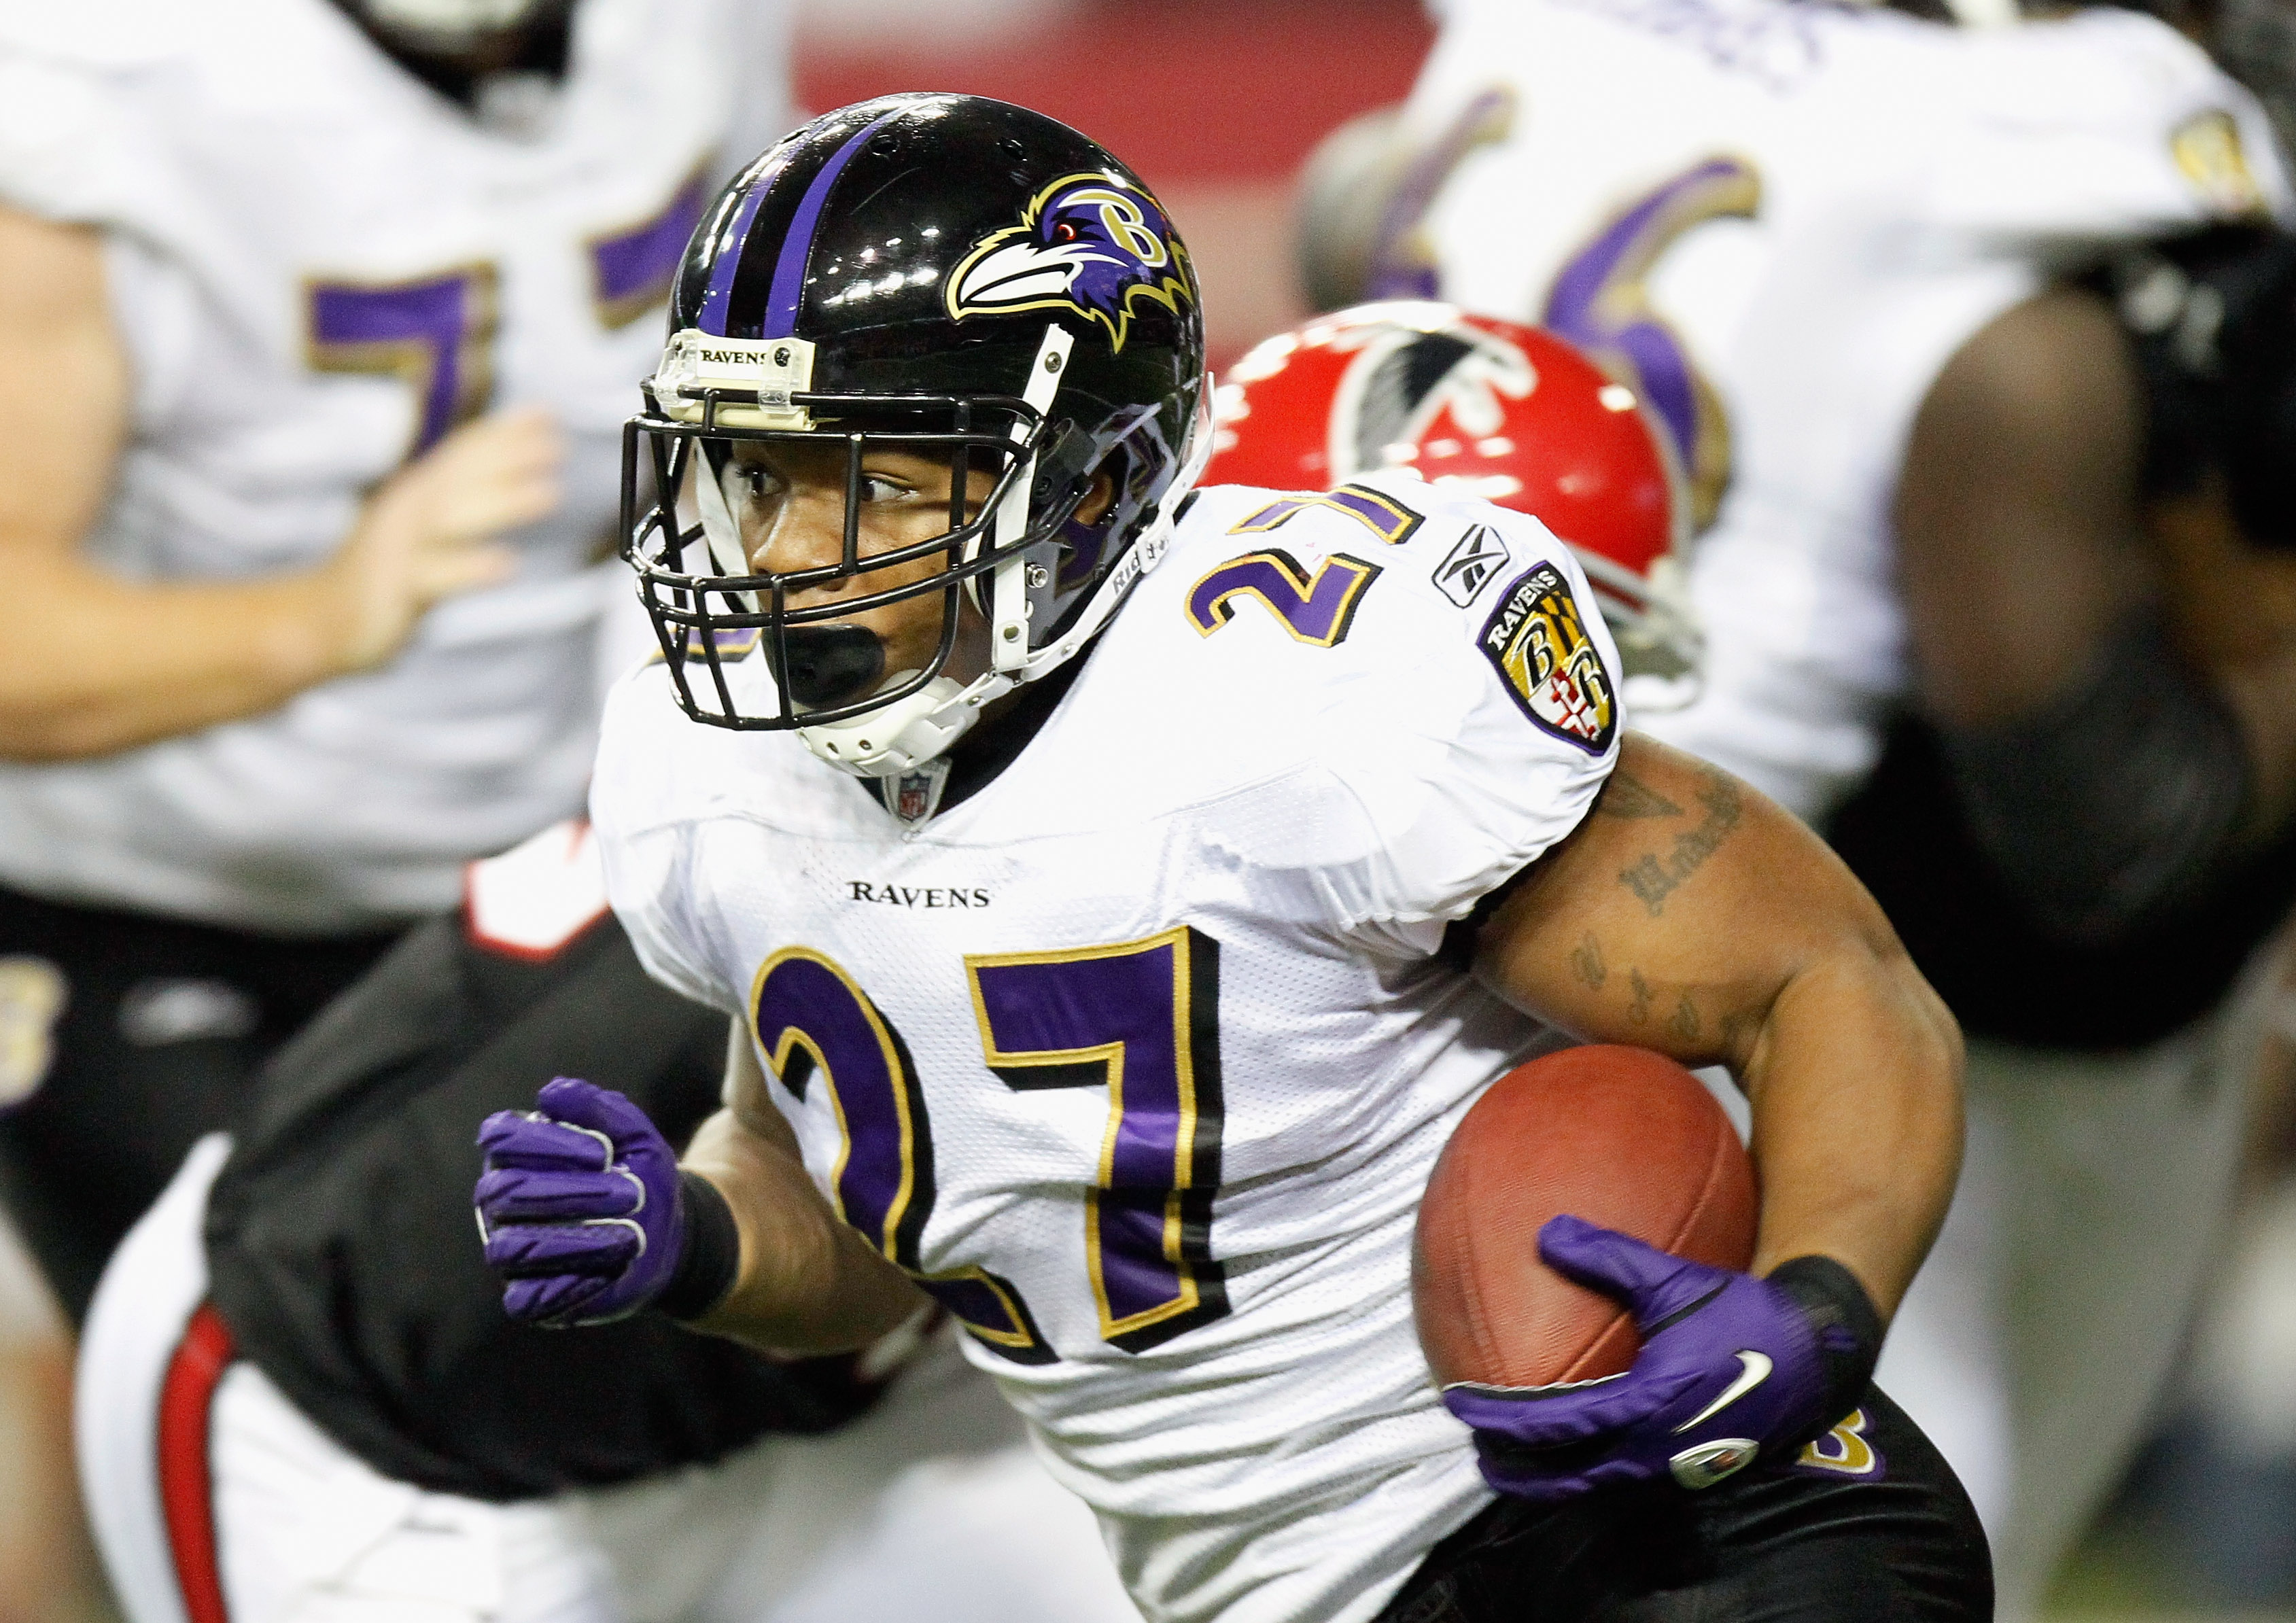 ATLANTA - NOVEMBER 11:  Ray Rice #27 of the Baltimore Ravens rushes upfield against the Atlanta Falcons at Georgia Dome on November 11, 2010 in Atlanta, Georgia.  (Photo by Kevin C. Cox/Getty Images)